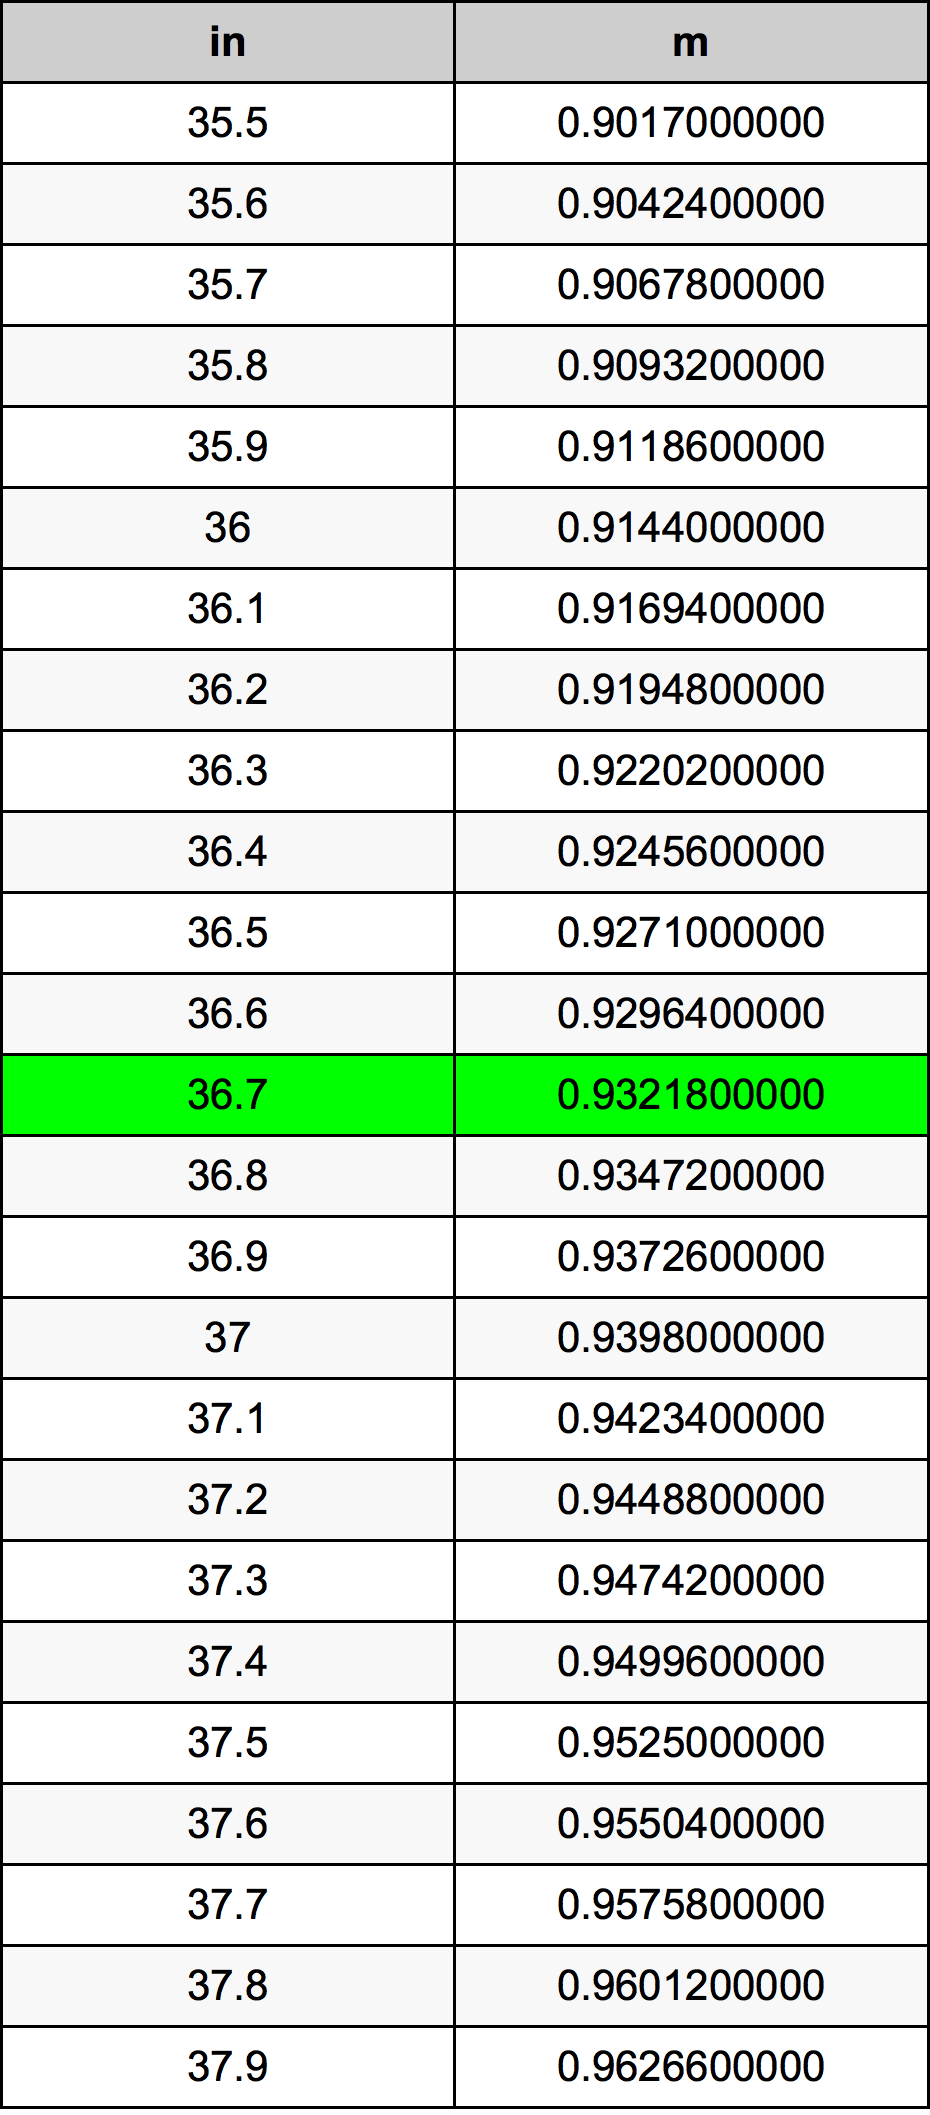 36.7 дюйм Таблица преобразования